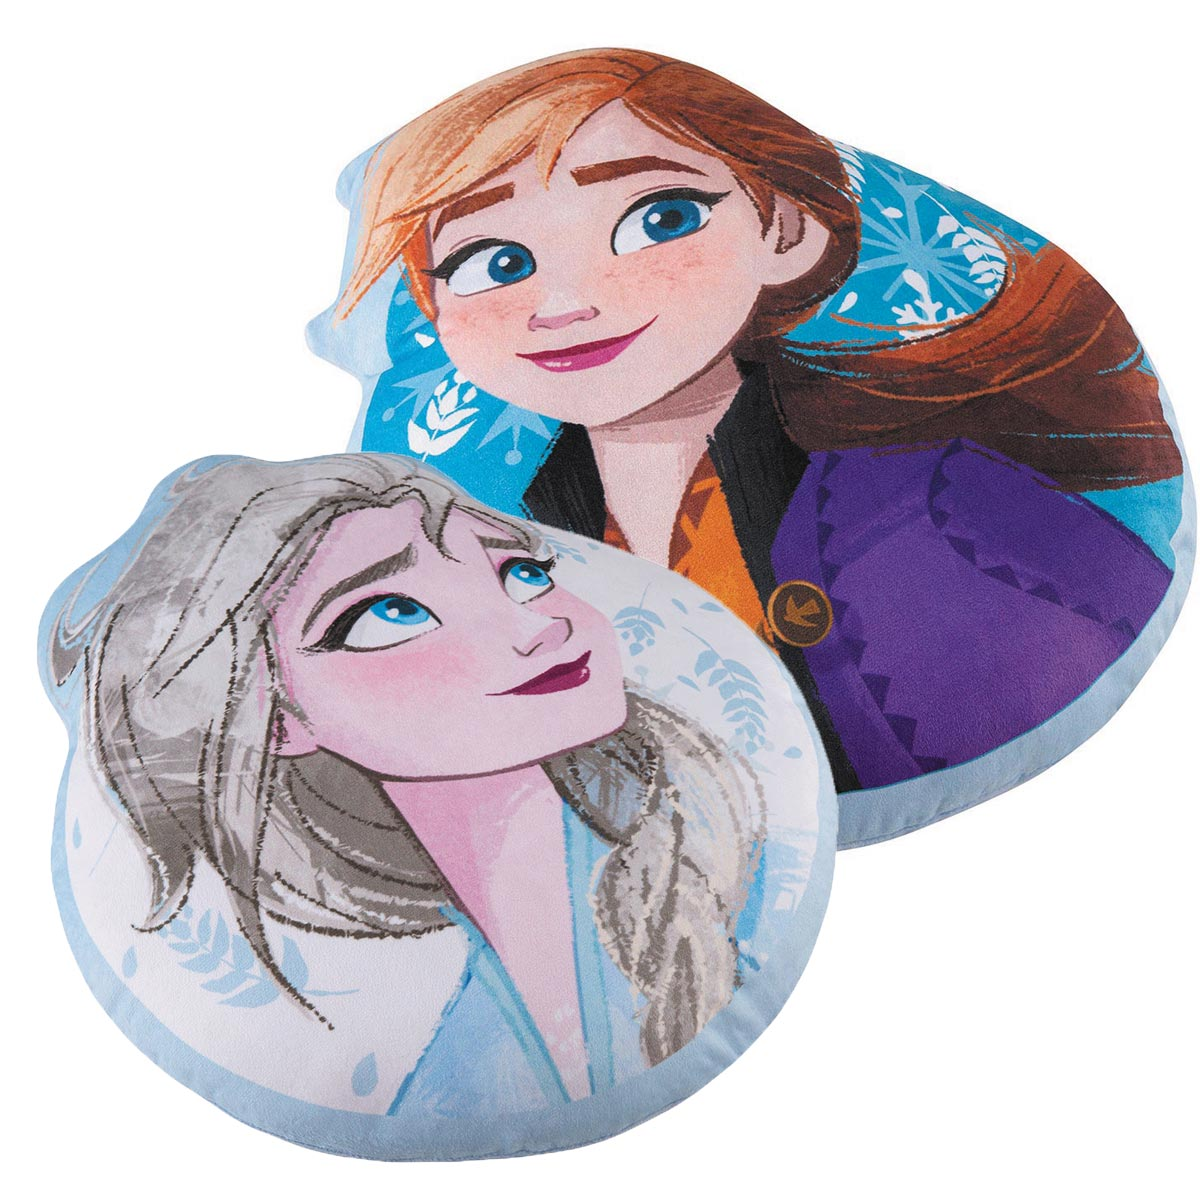 Almofada Infantil Personagem Frozen Anna E Elsa Lepper